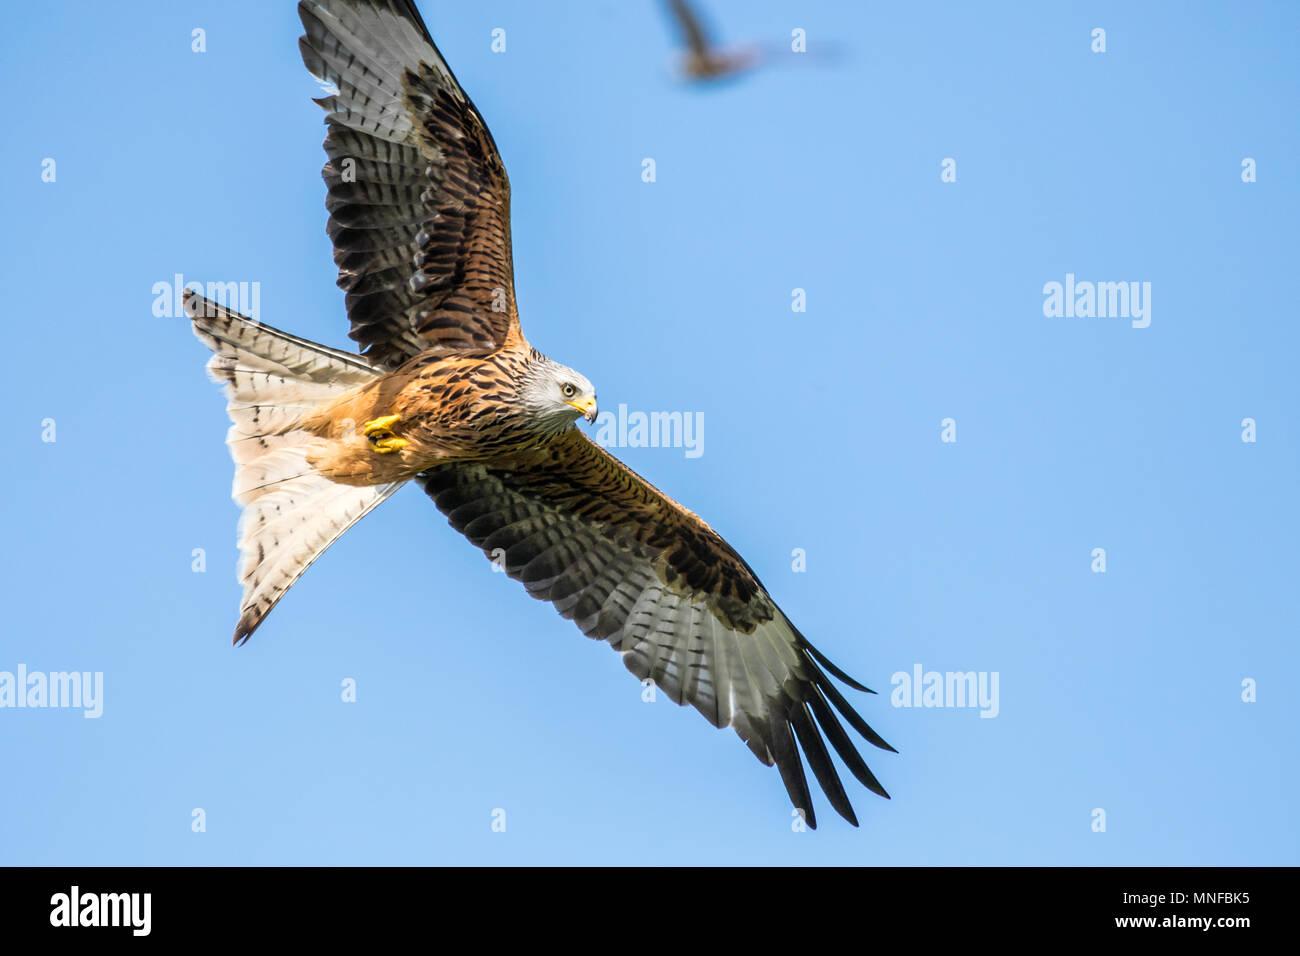 Flying Red Kite Stock Photo